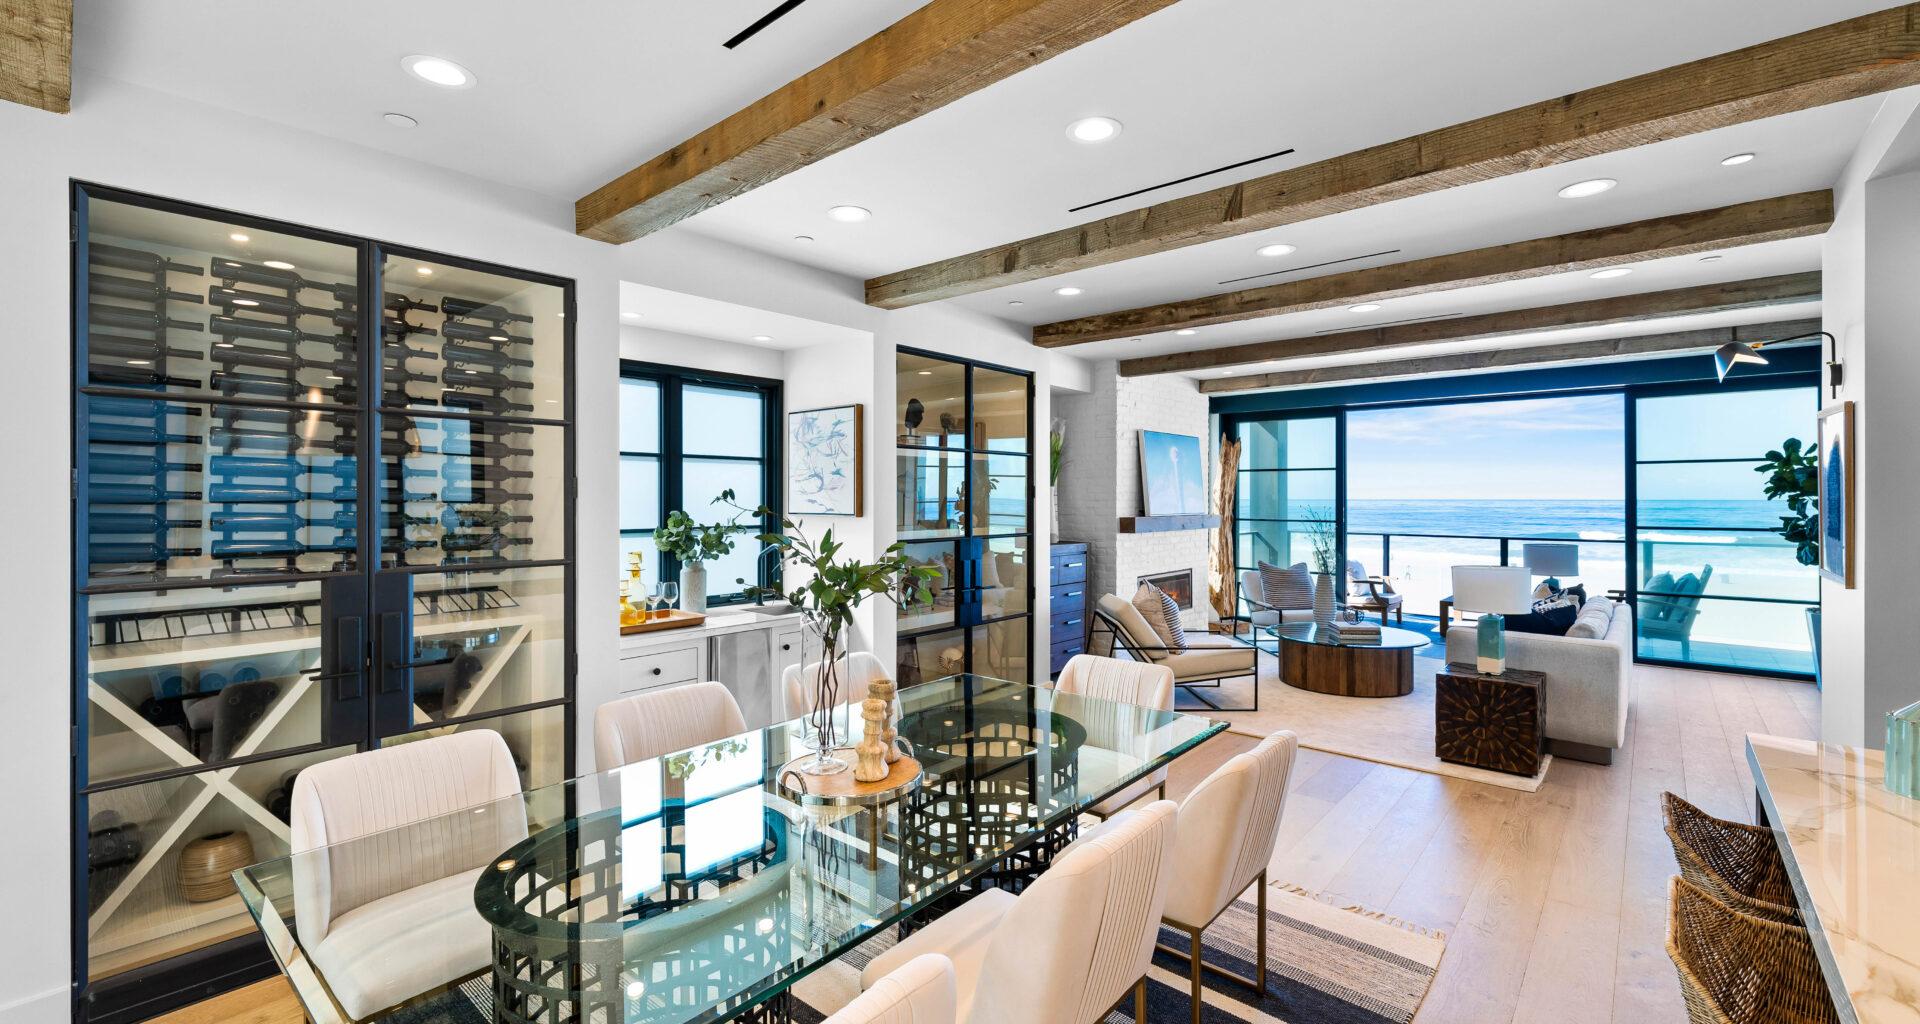 Robb Stroyke, The Strand, 508 The Strand, Stroyke Properties, Jon Starr, Starr Design Group, Manhattan Beach